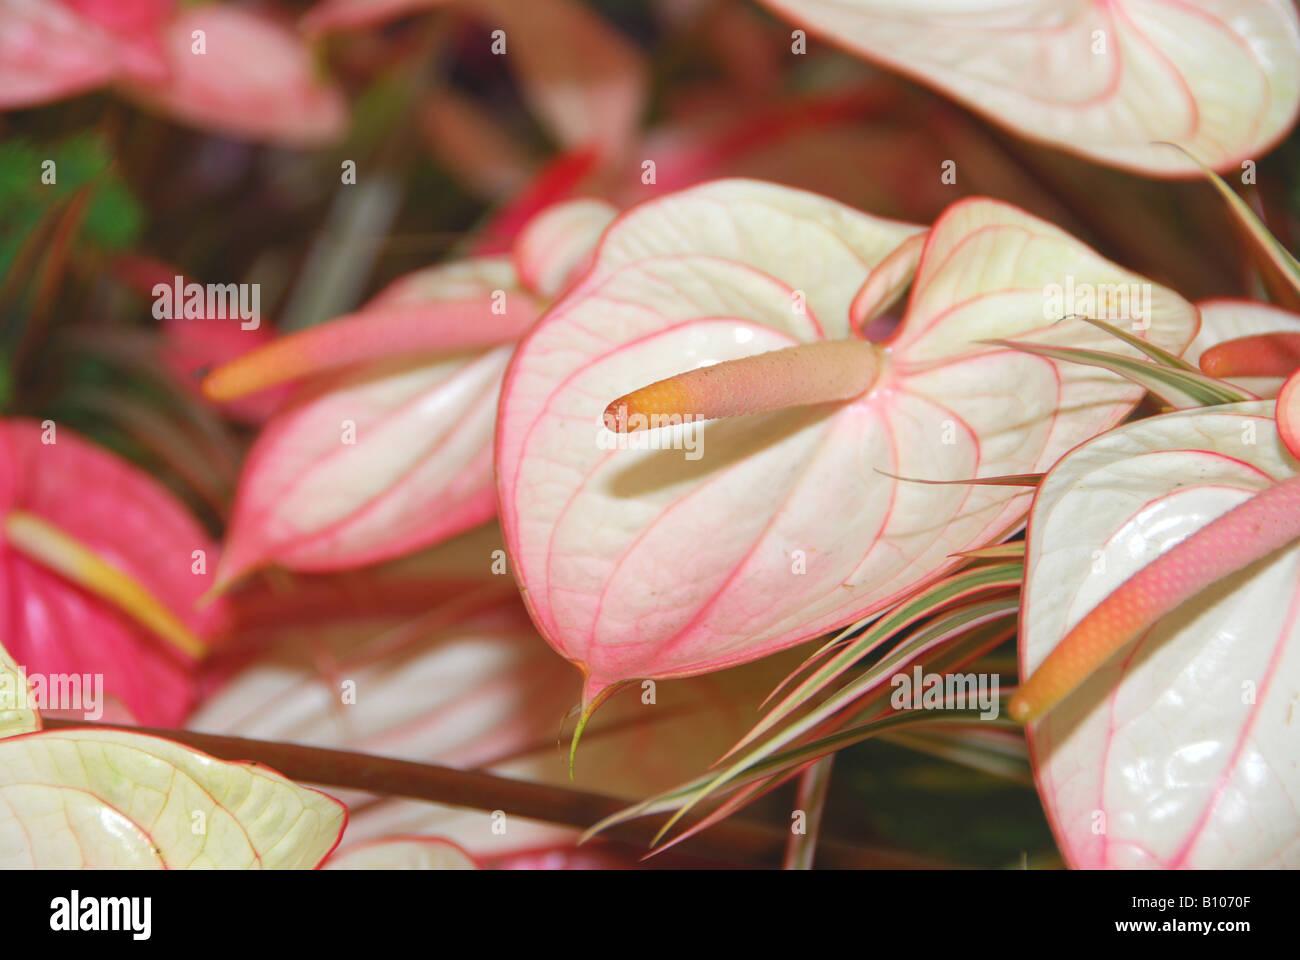 Chelsea Flower Show 2008 Anthurium Fantasia - Stock Image